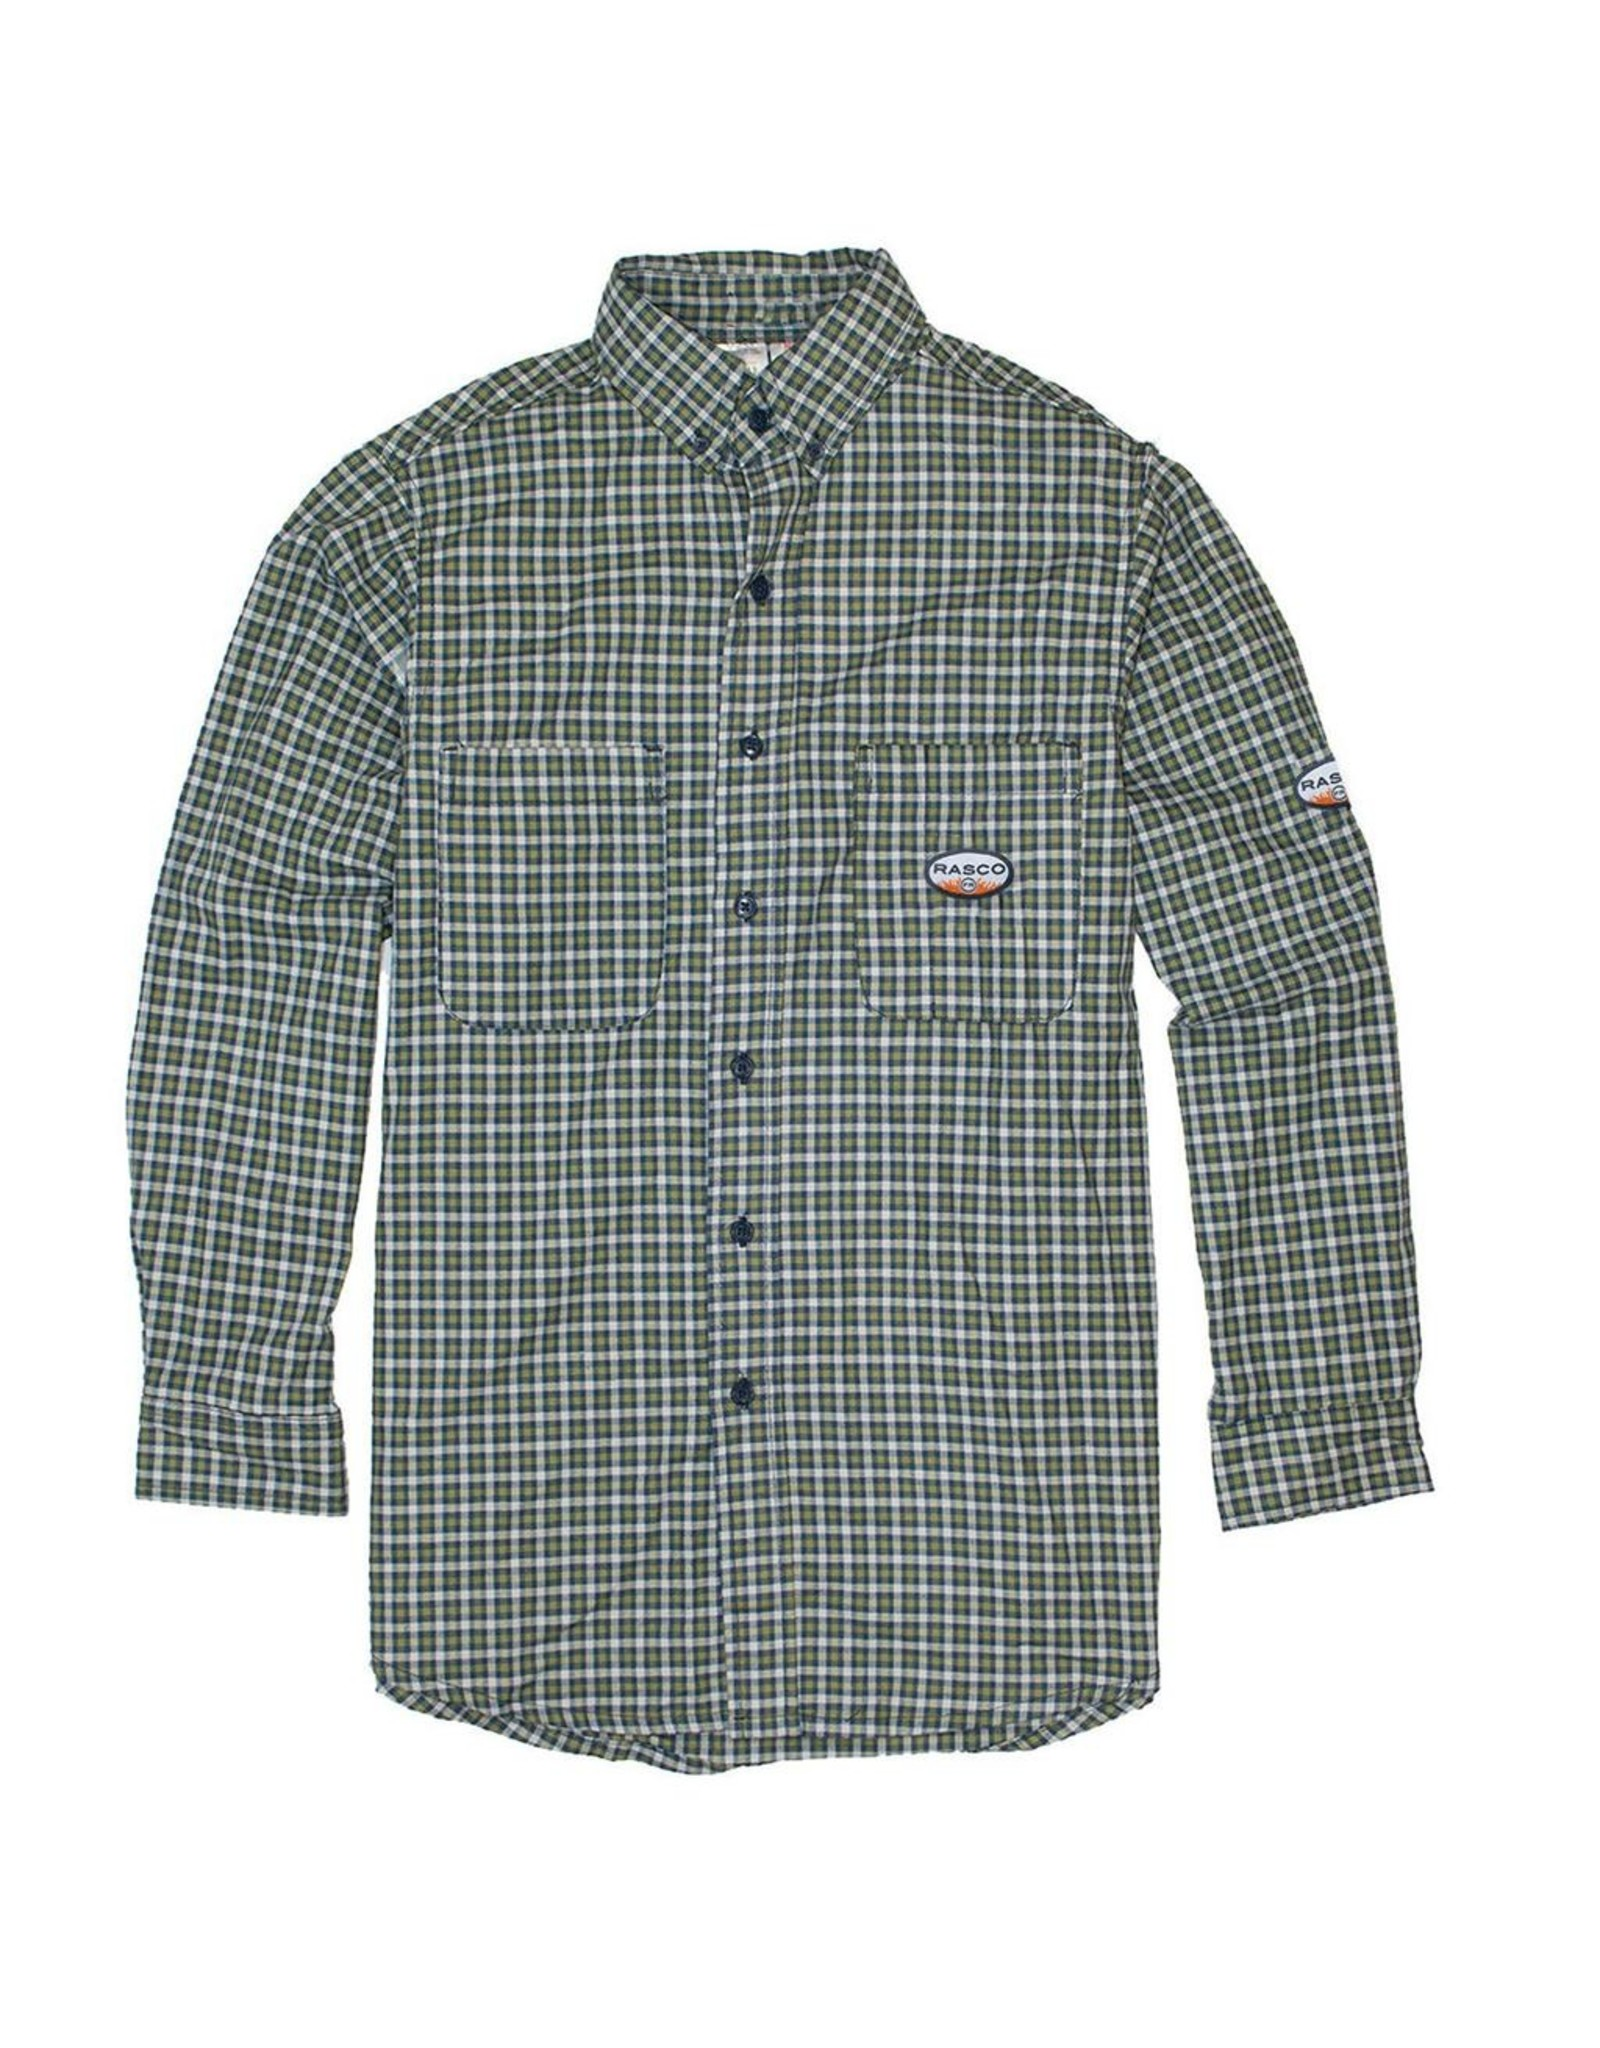 Tops-Men RASCO FR0824GN<br /> Flame Resistant WorkwearDress & Plaid Shirts